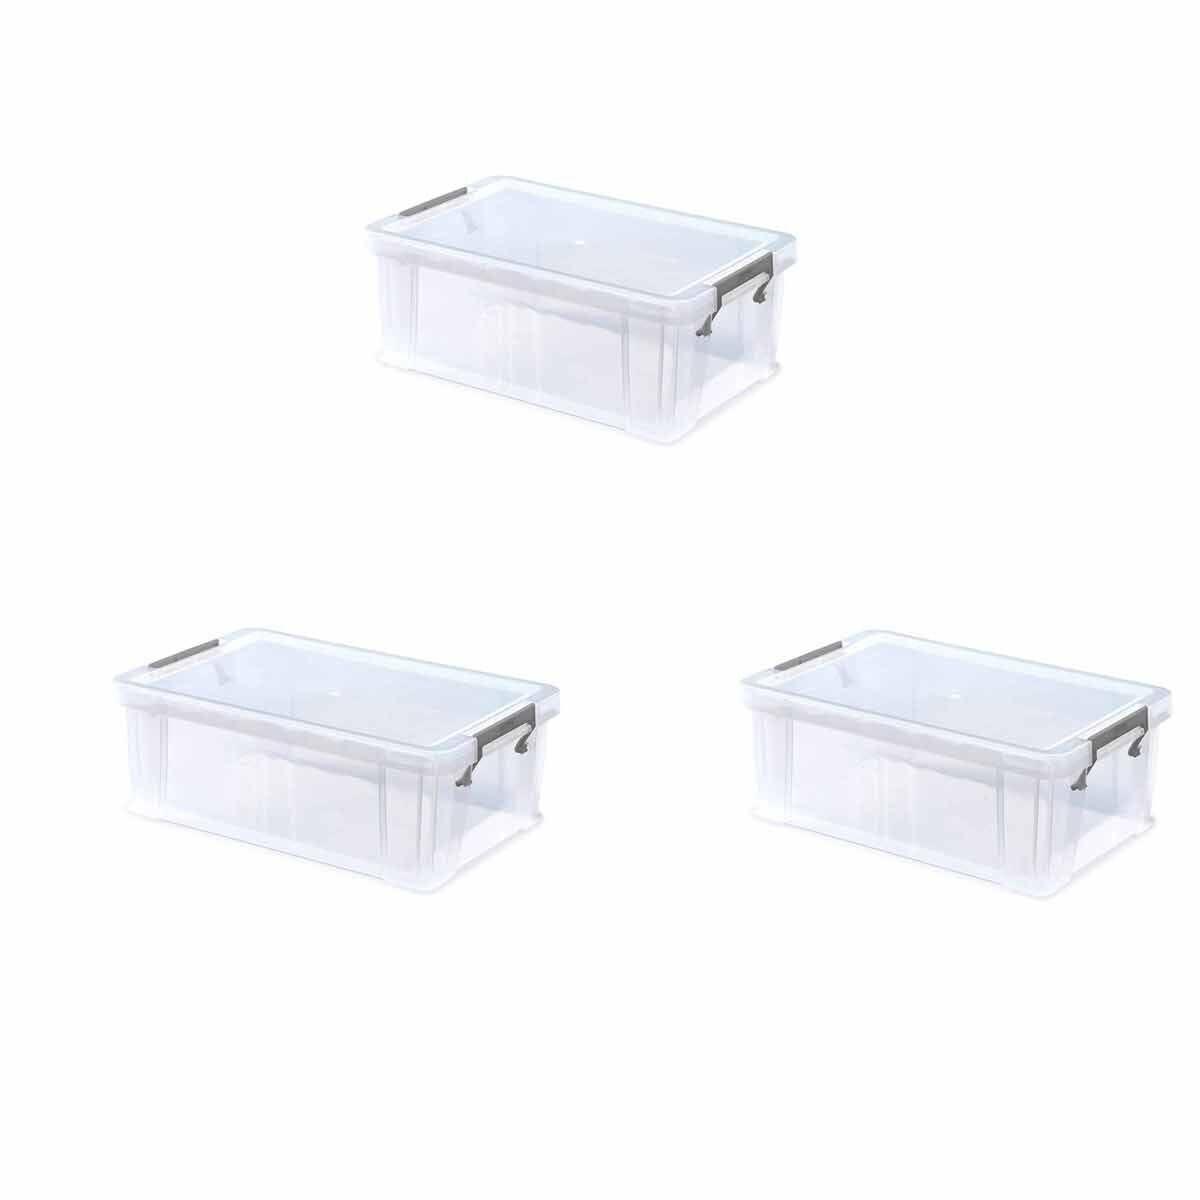 Whitefurze Allstore Plastic Storage Box 10 Litre Pack of 3